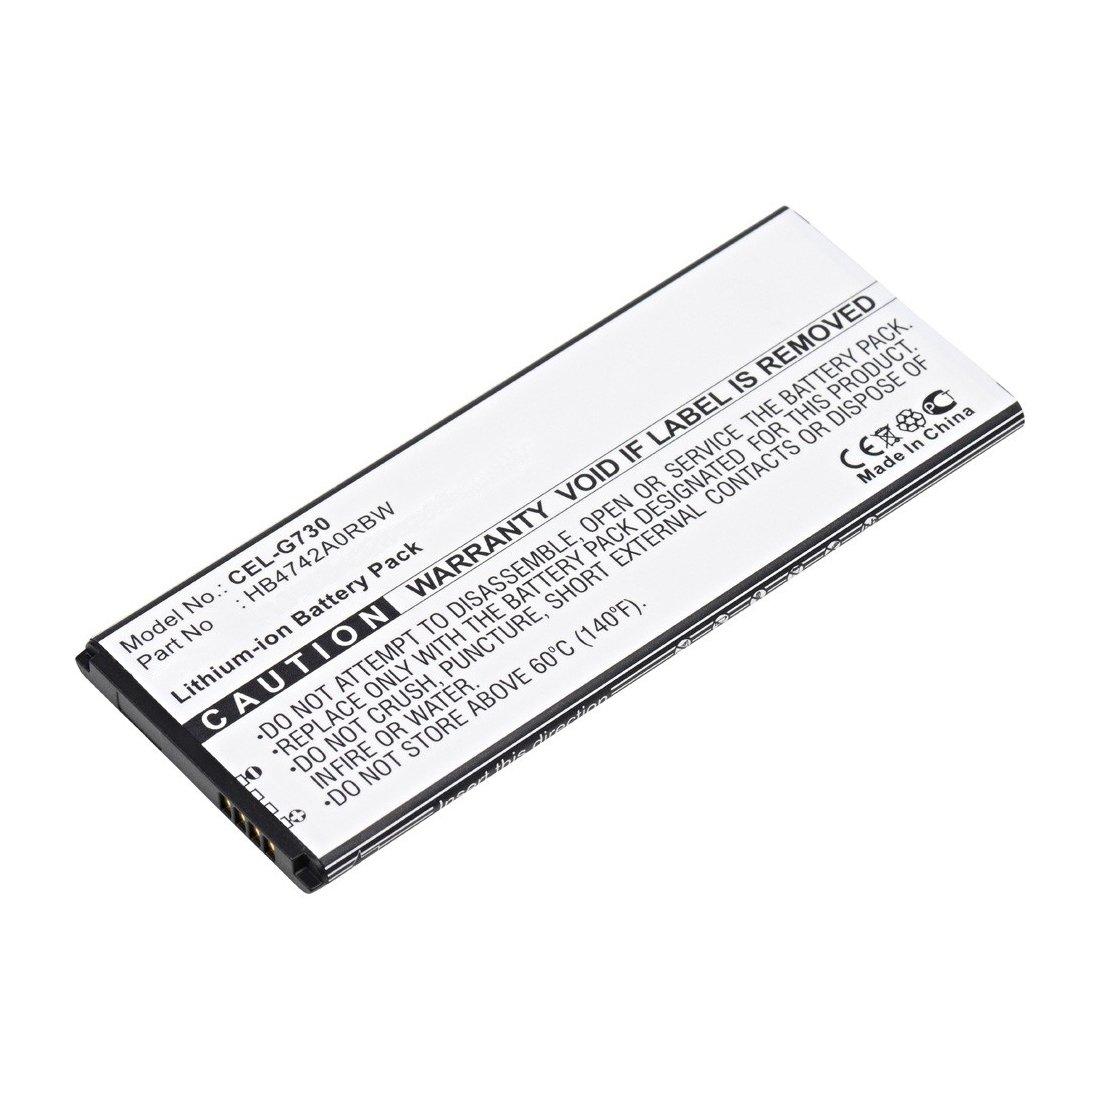 P Cel G730 Huawei Hb4742a0rbc Battery